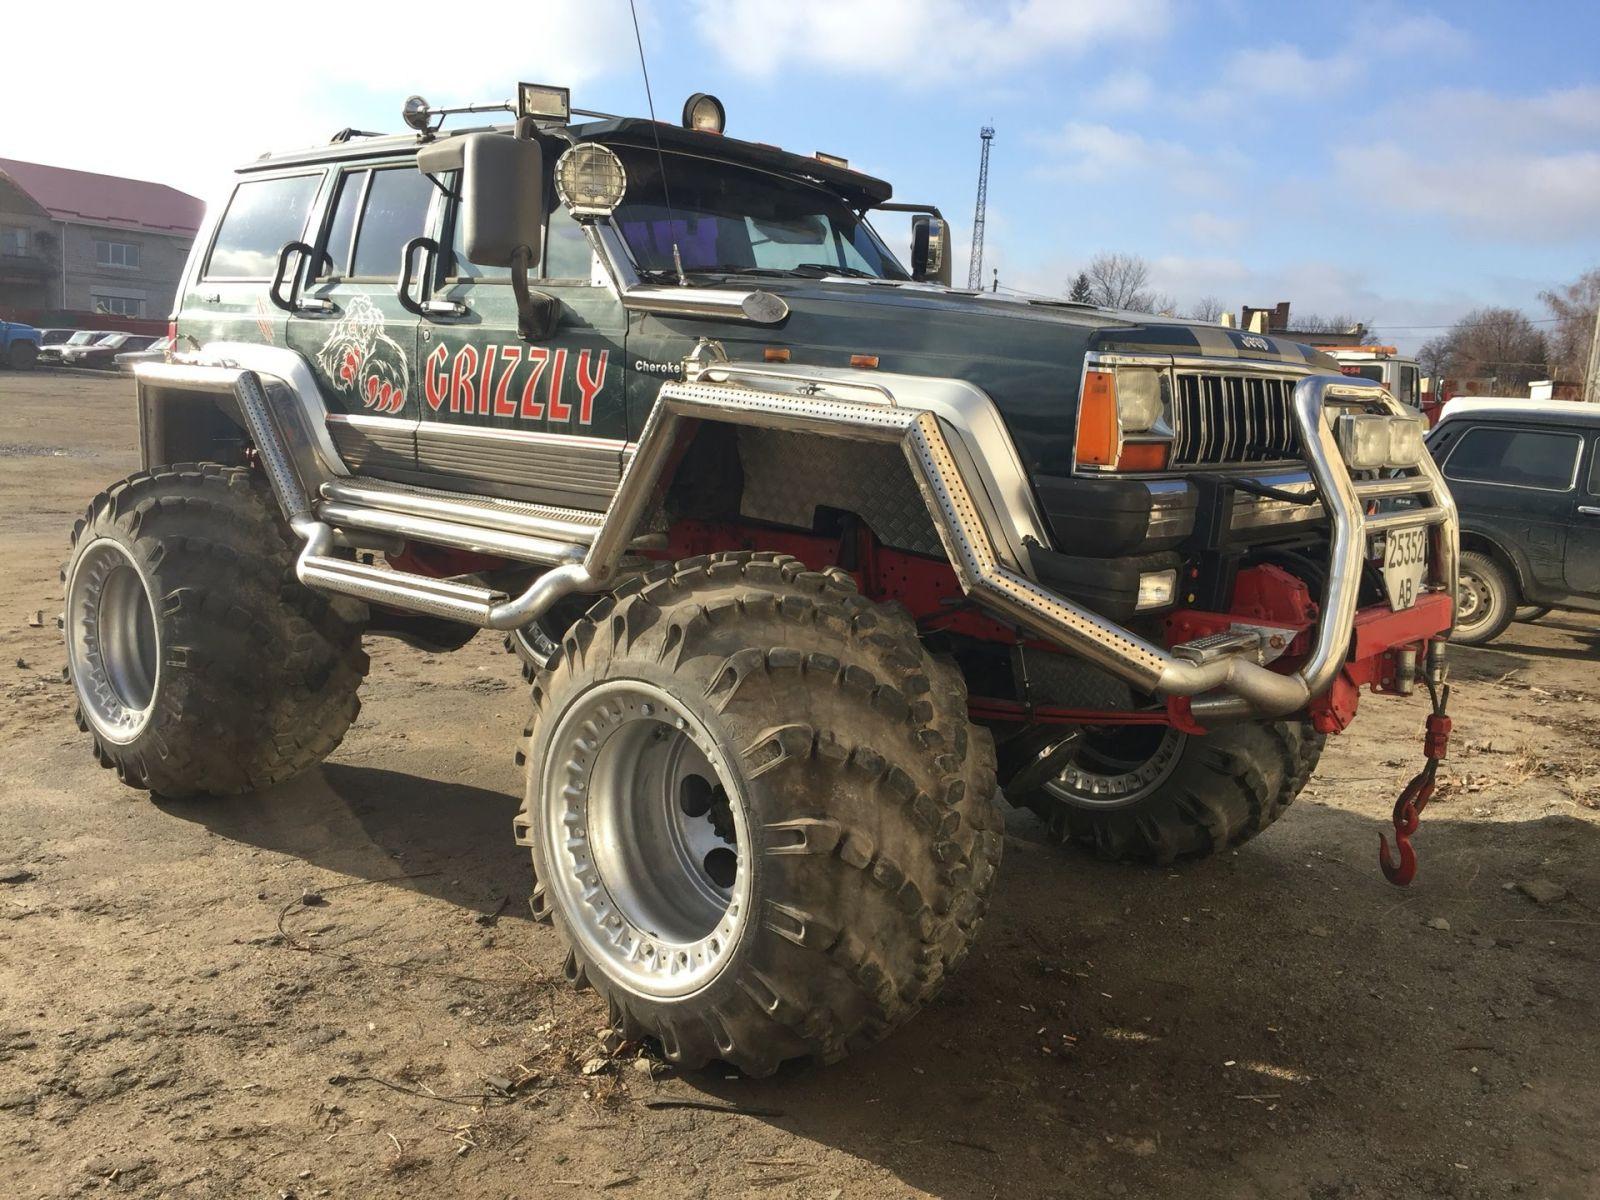 jeep на арочных колесах